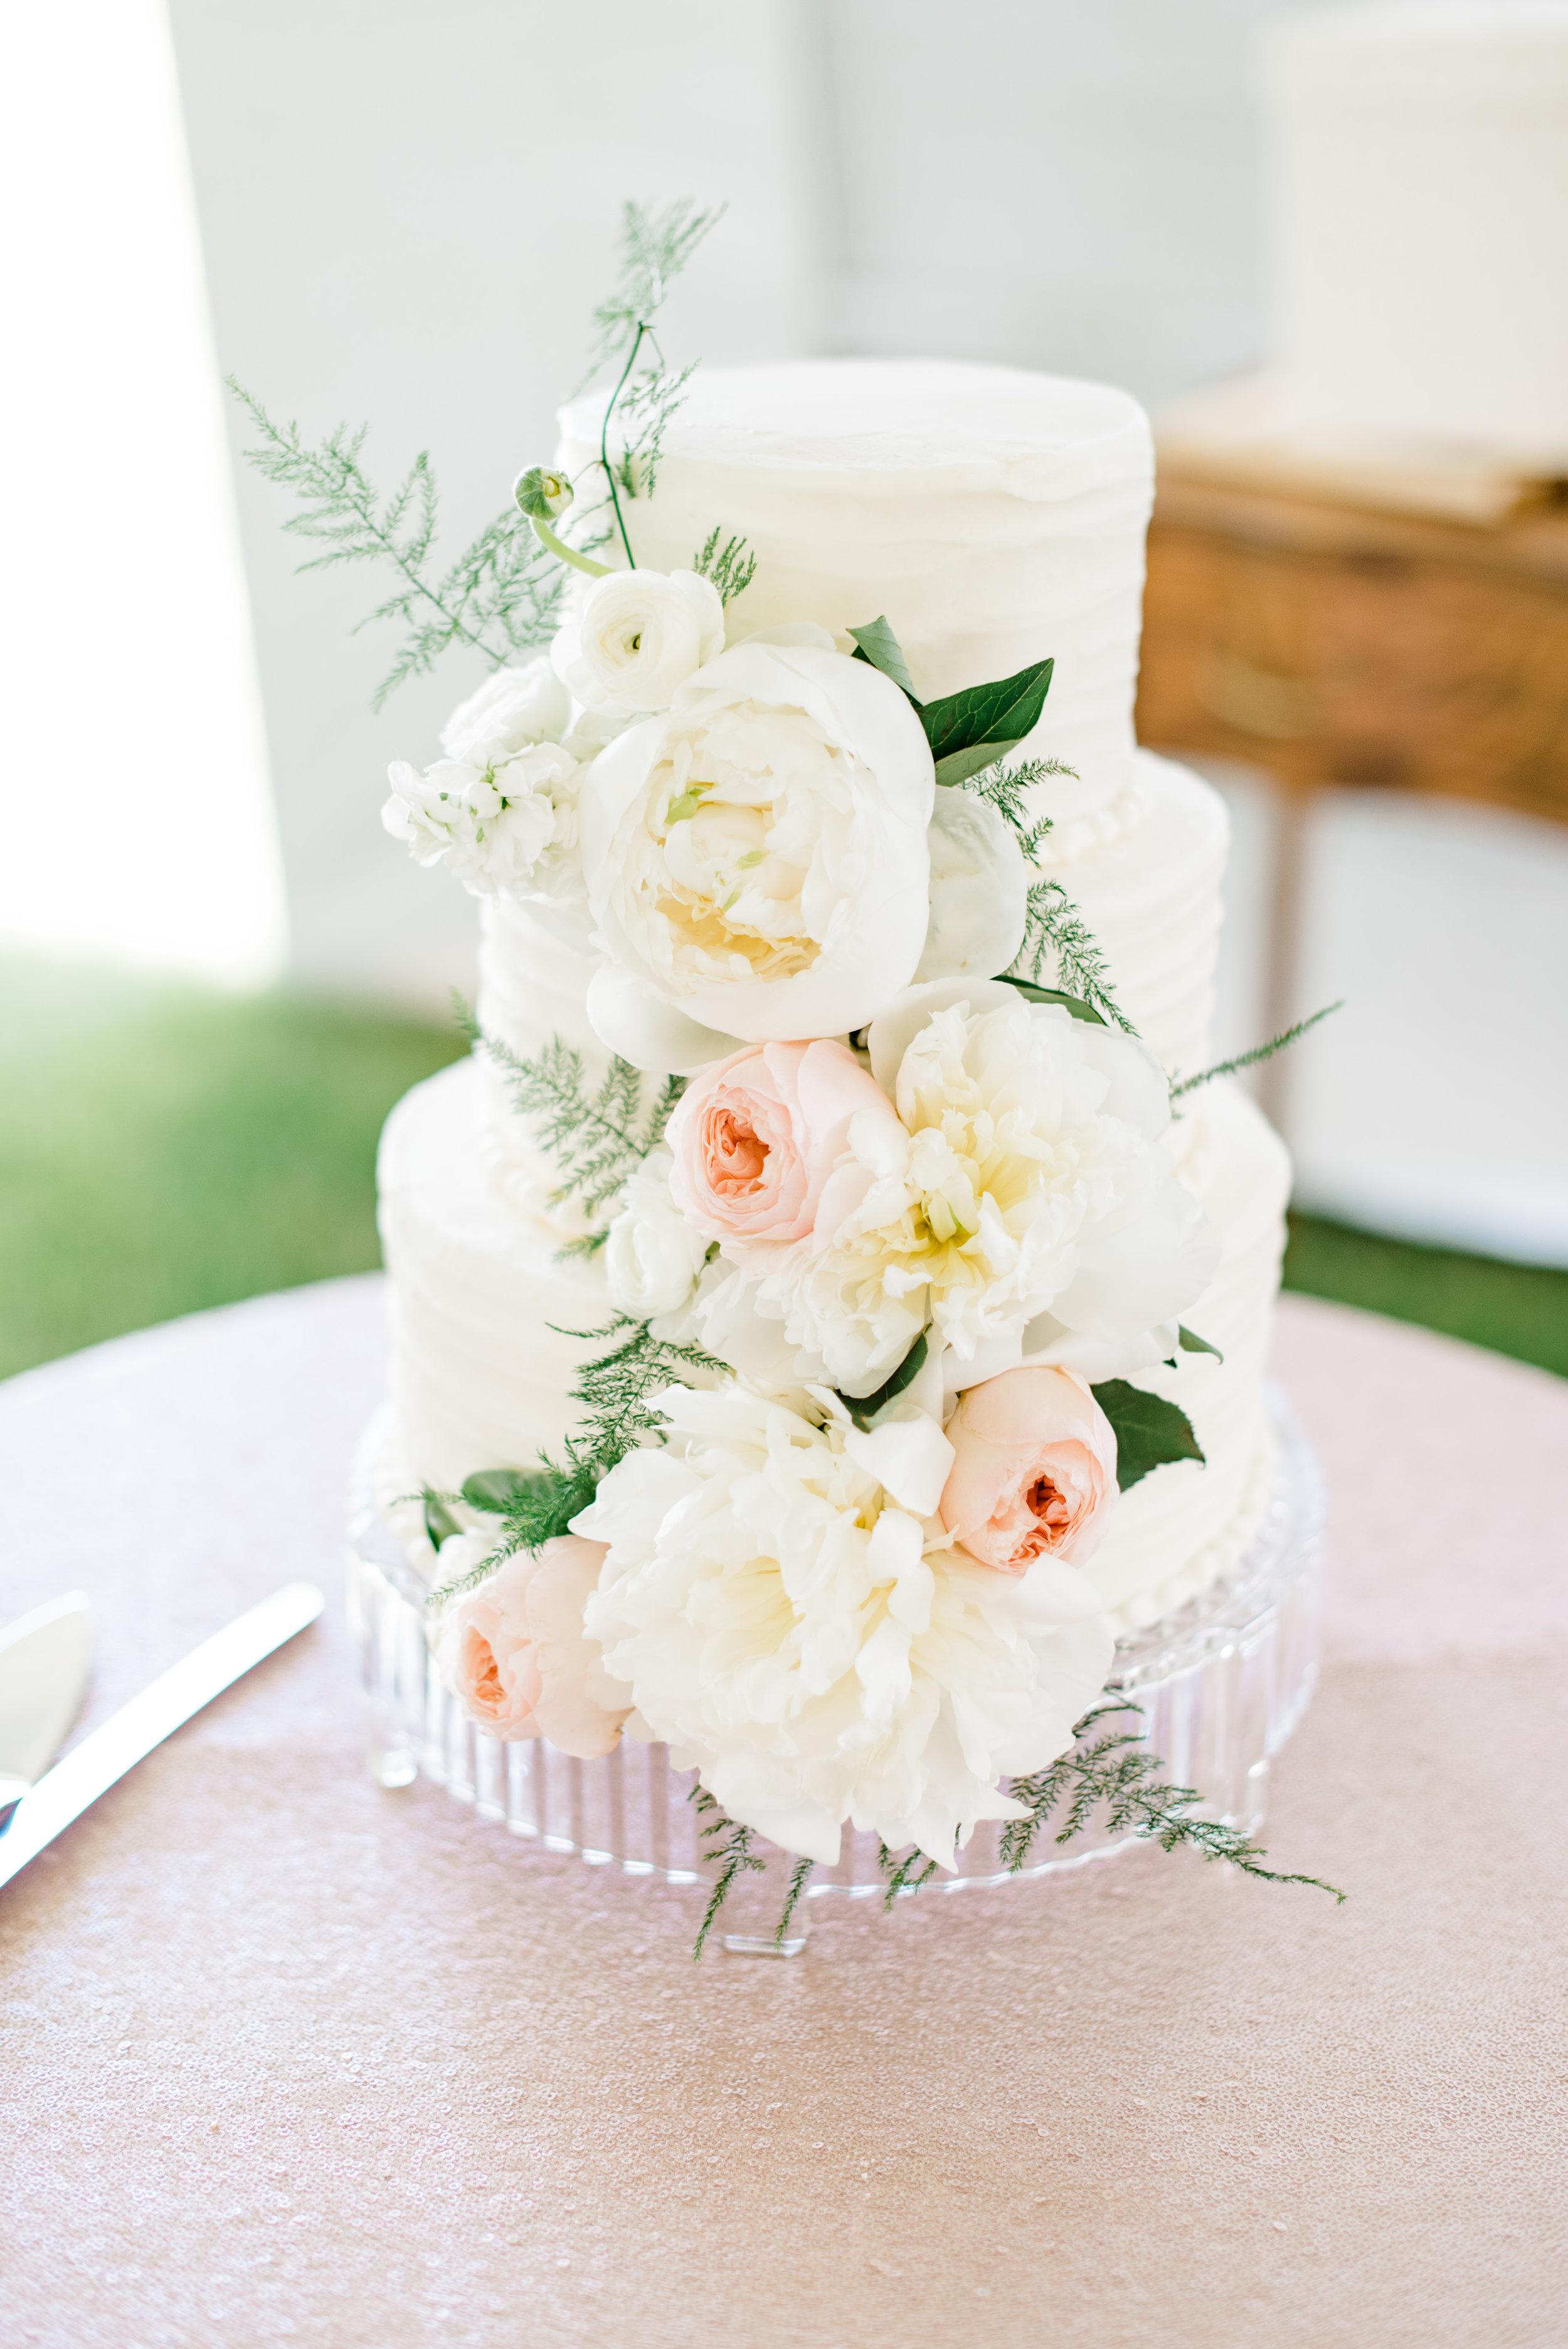 Anthony-and-stork-Weddings-323.jpg